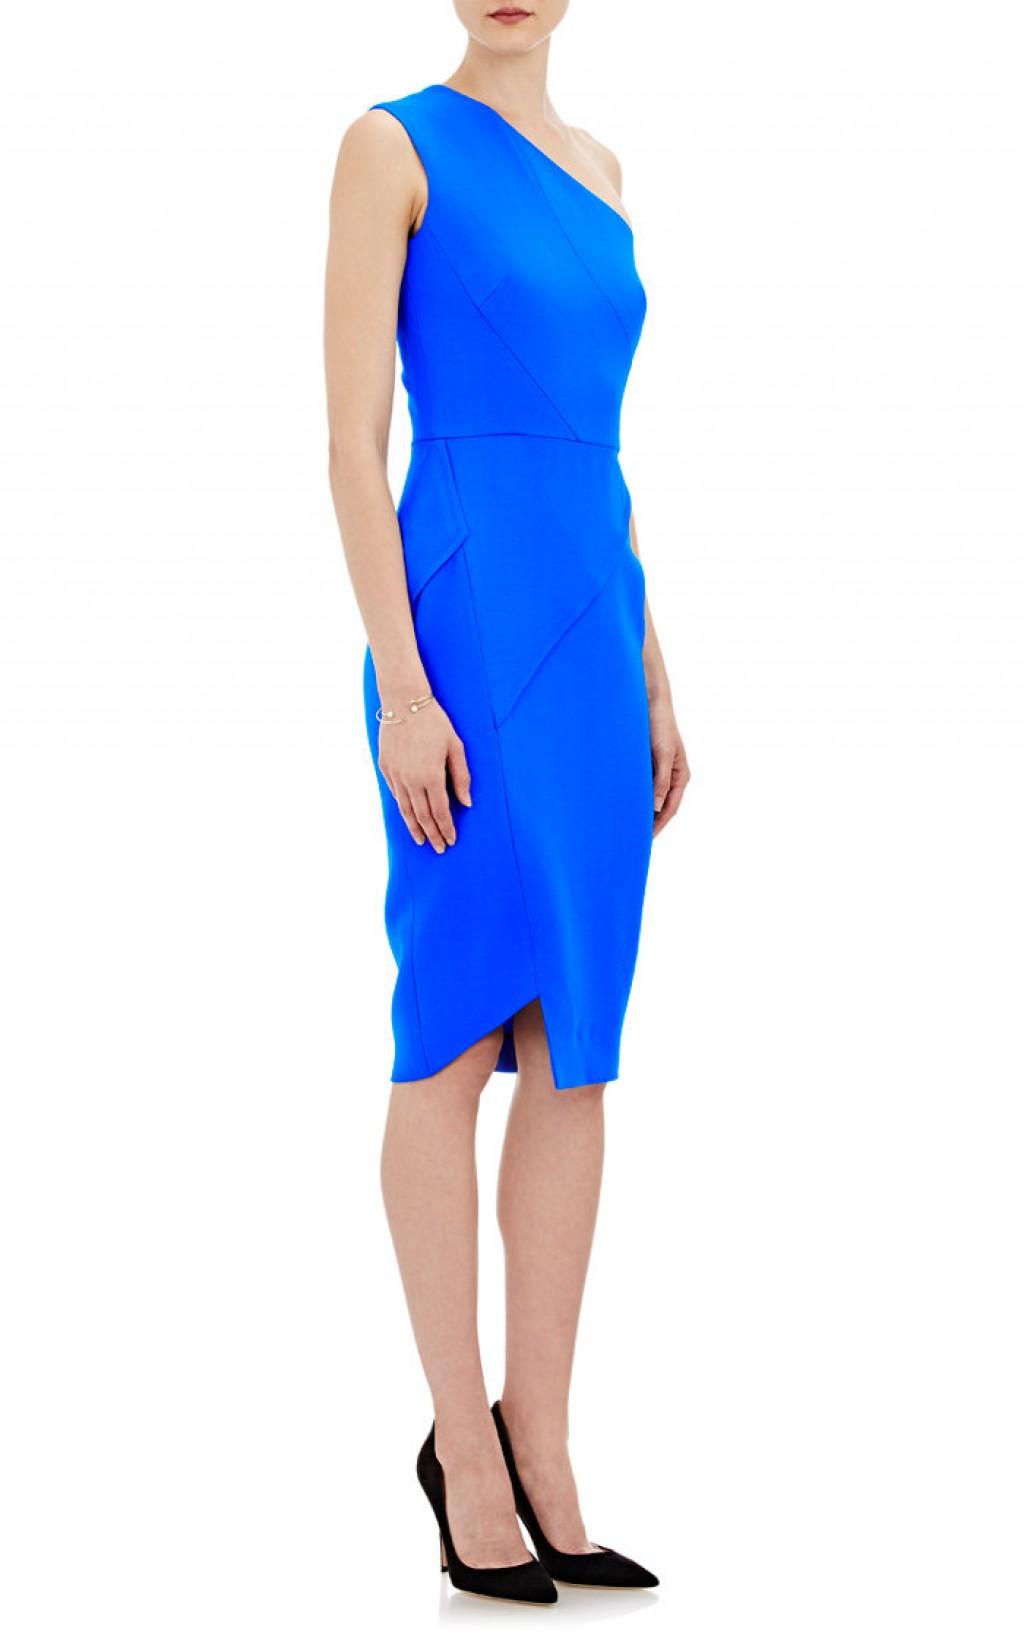 victoria-beckham-blue-dress-jennifer-lopez-2-1024x1641